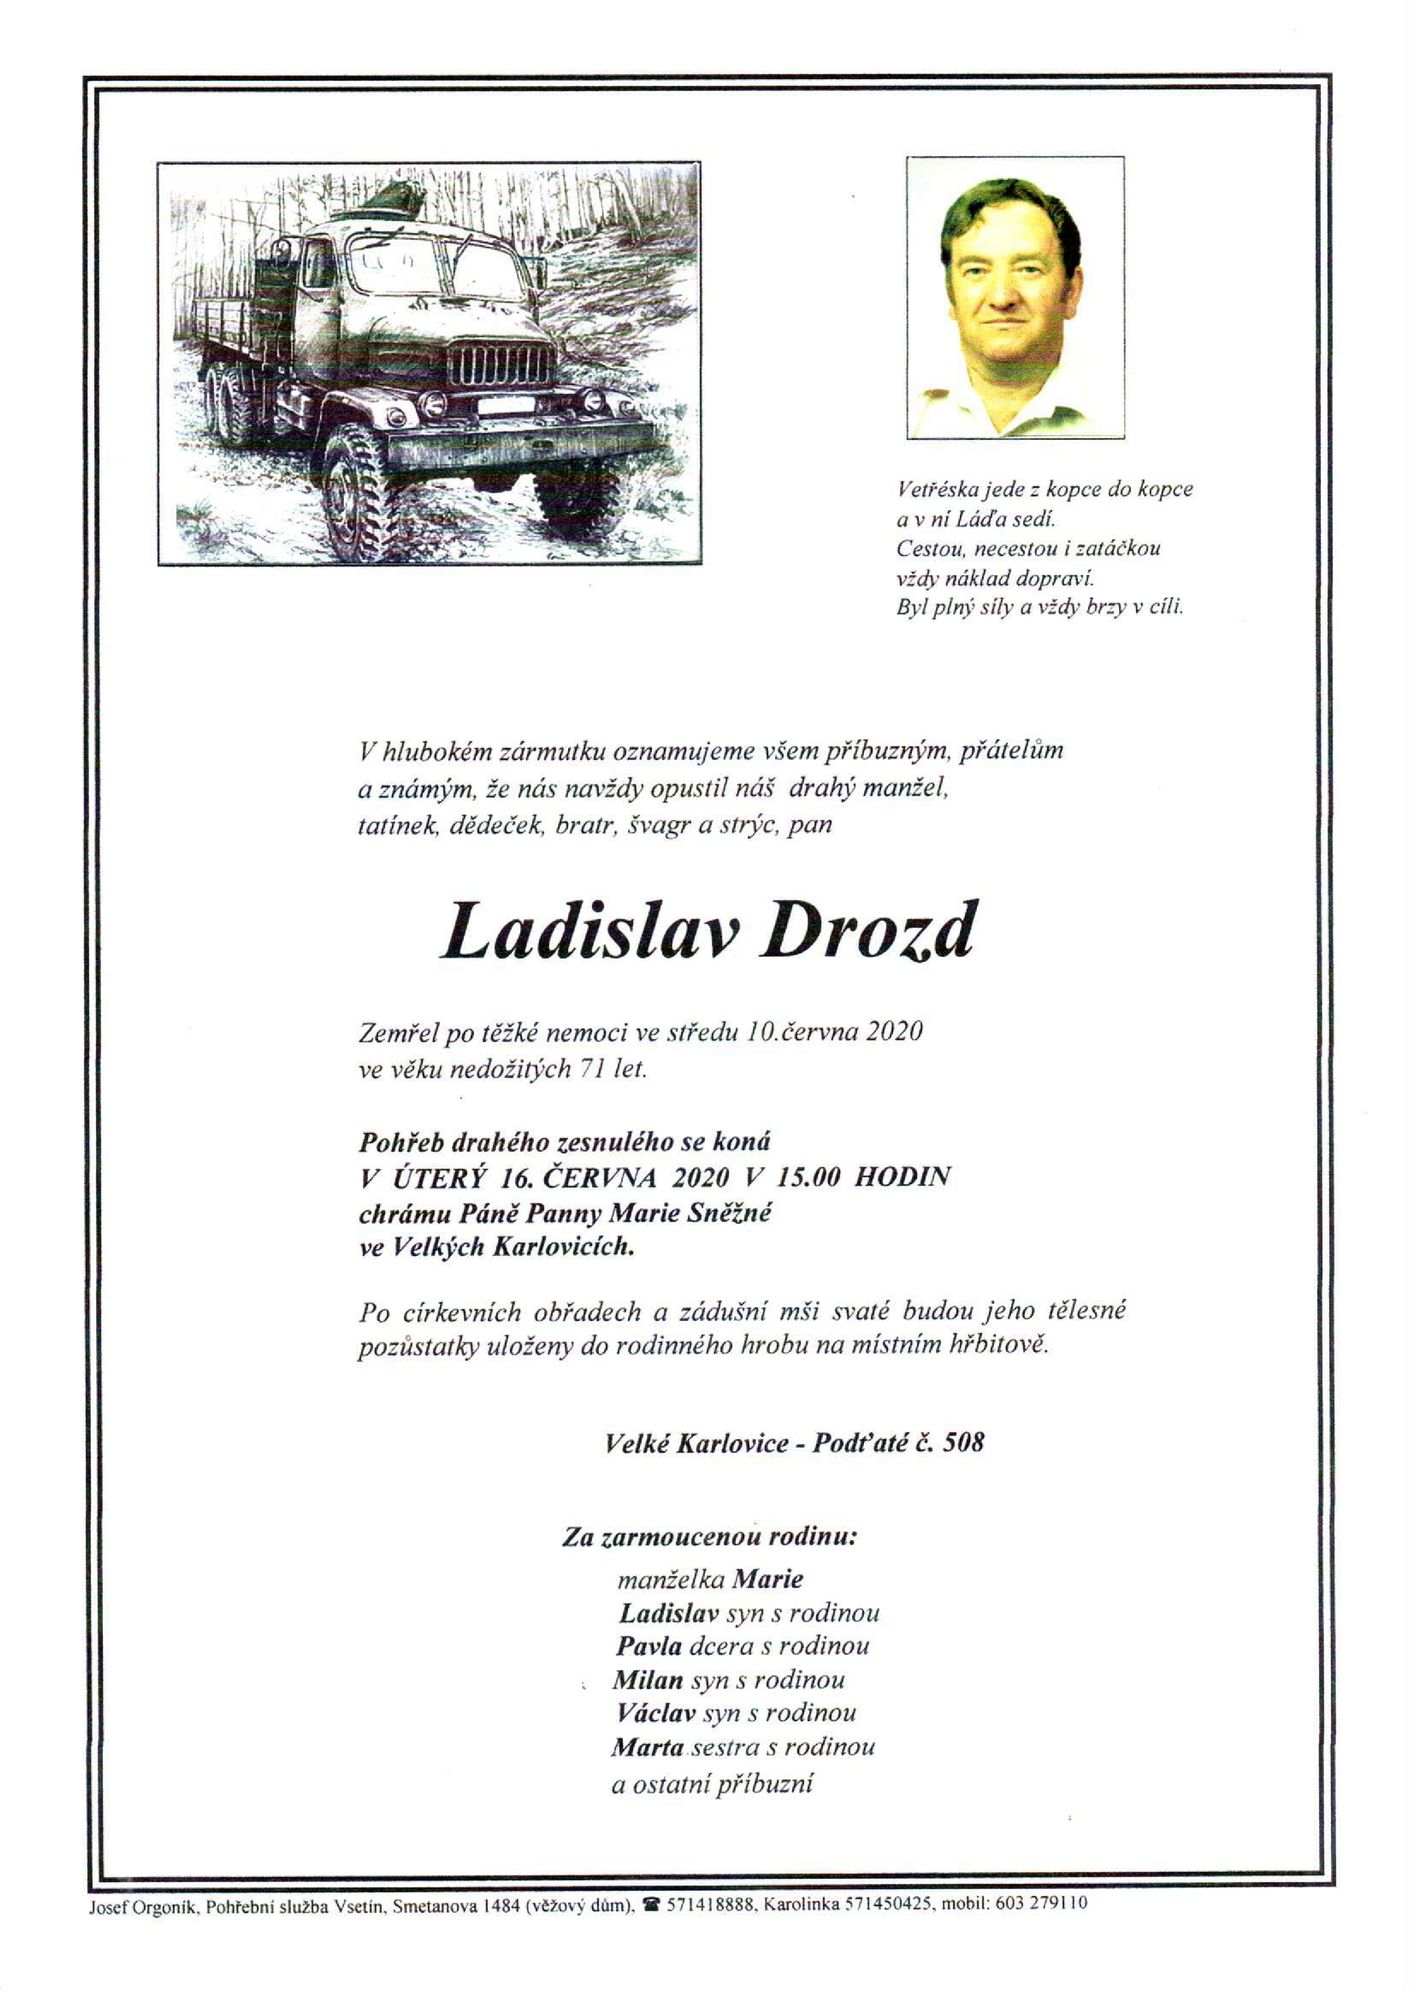 Ladislav Drozd